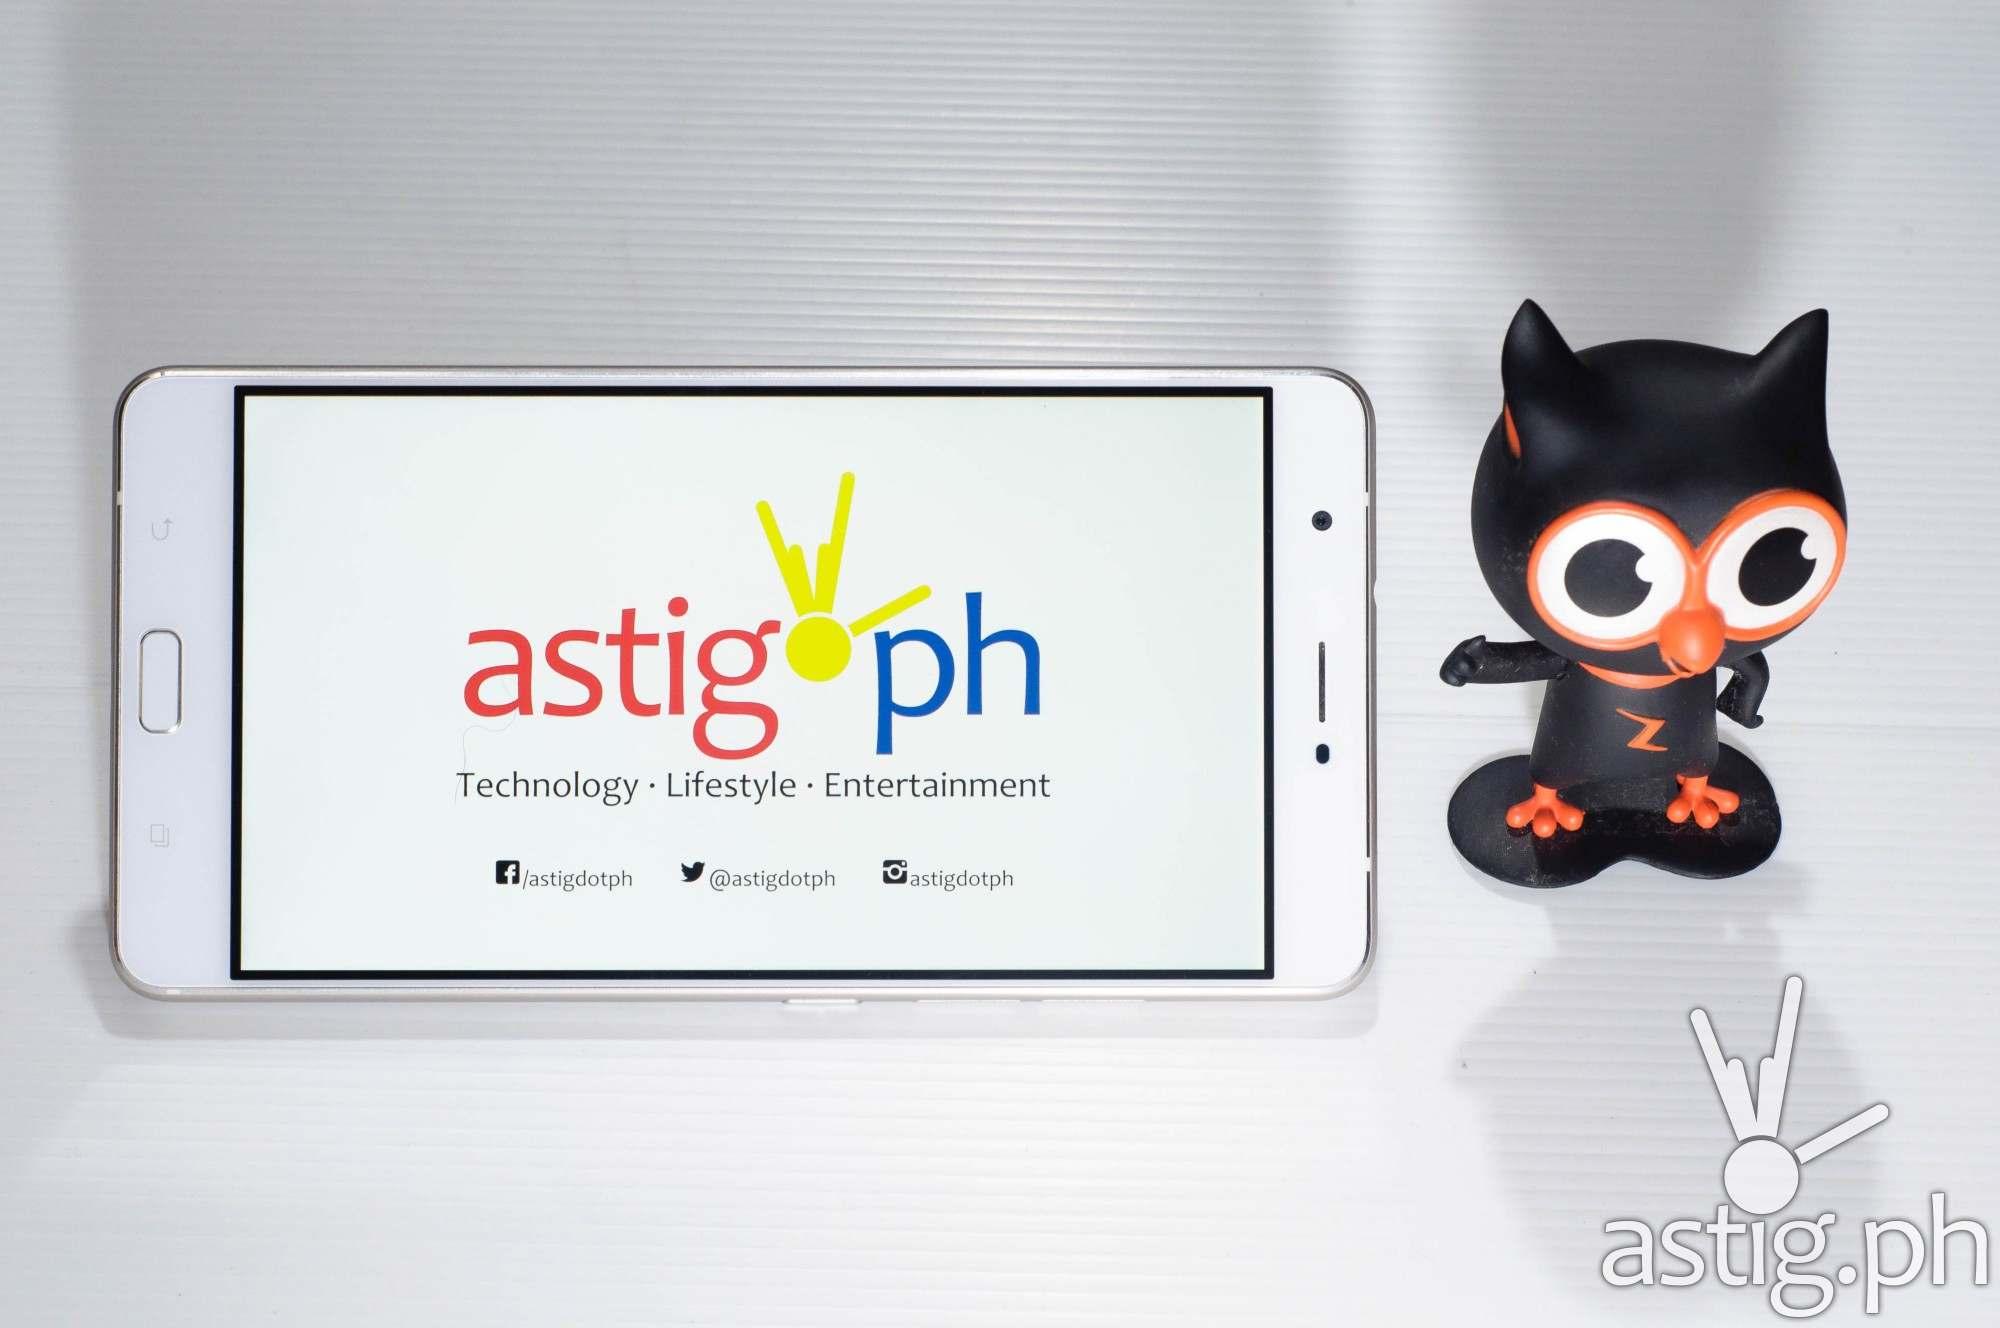 ASUS Zenfone 3 Ultra - front shot